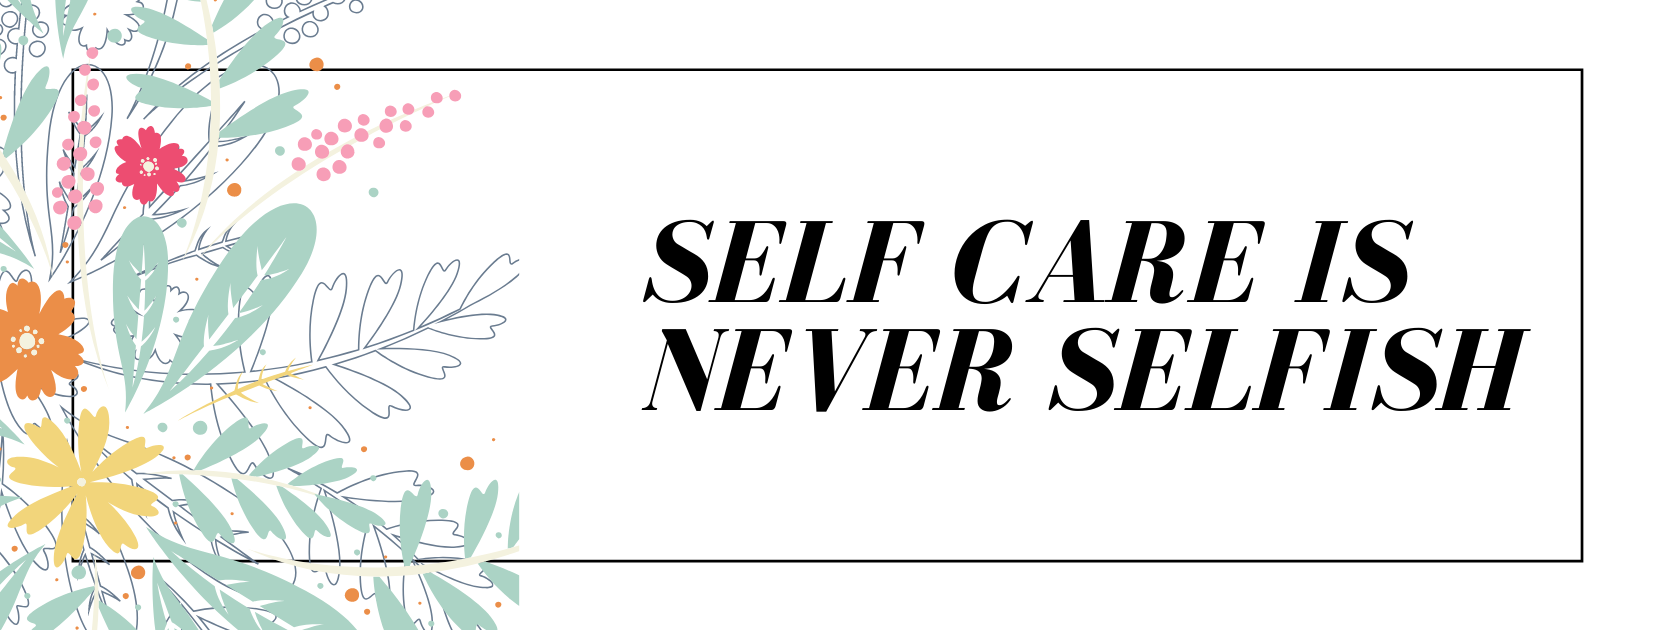 quick self care